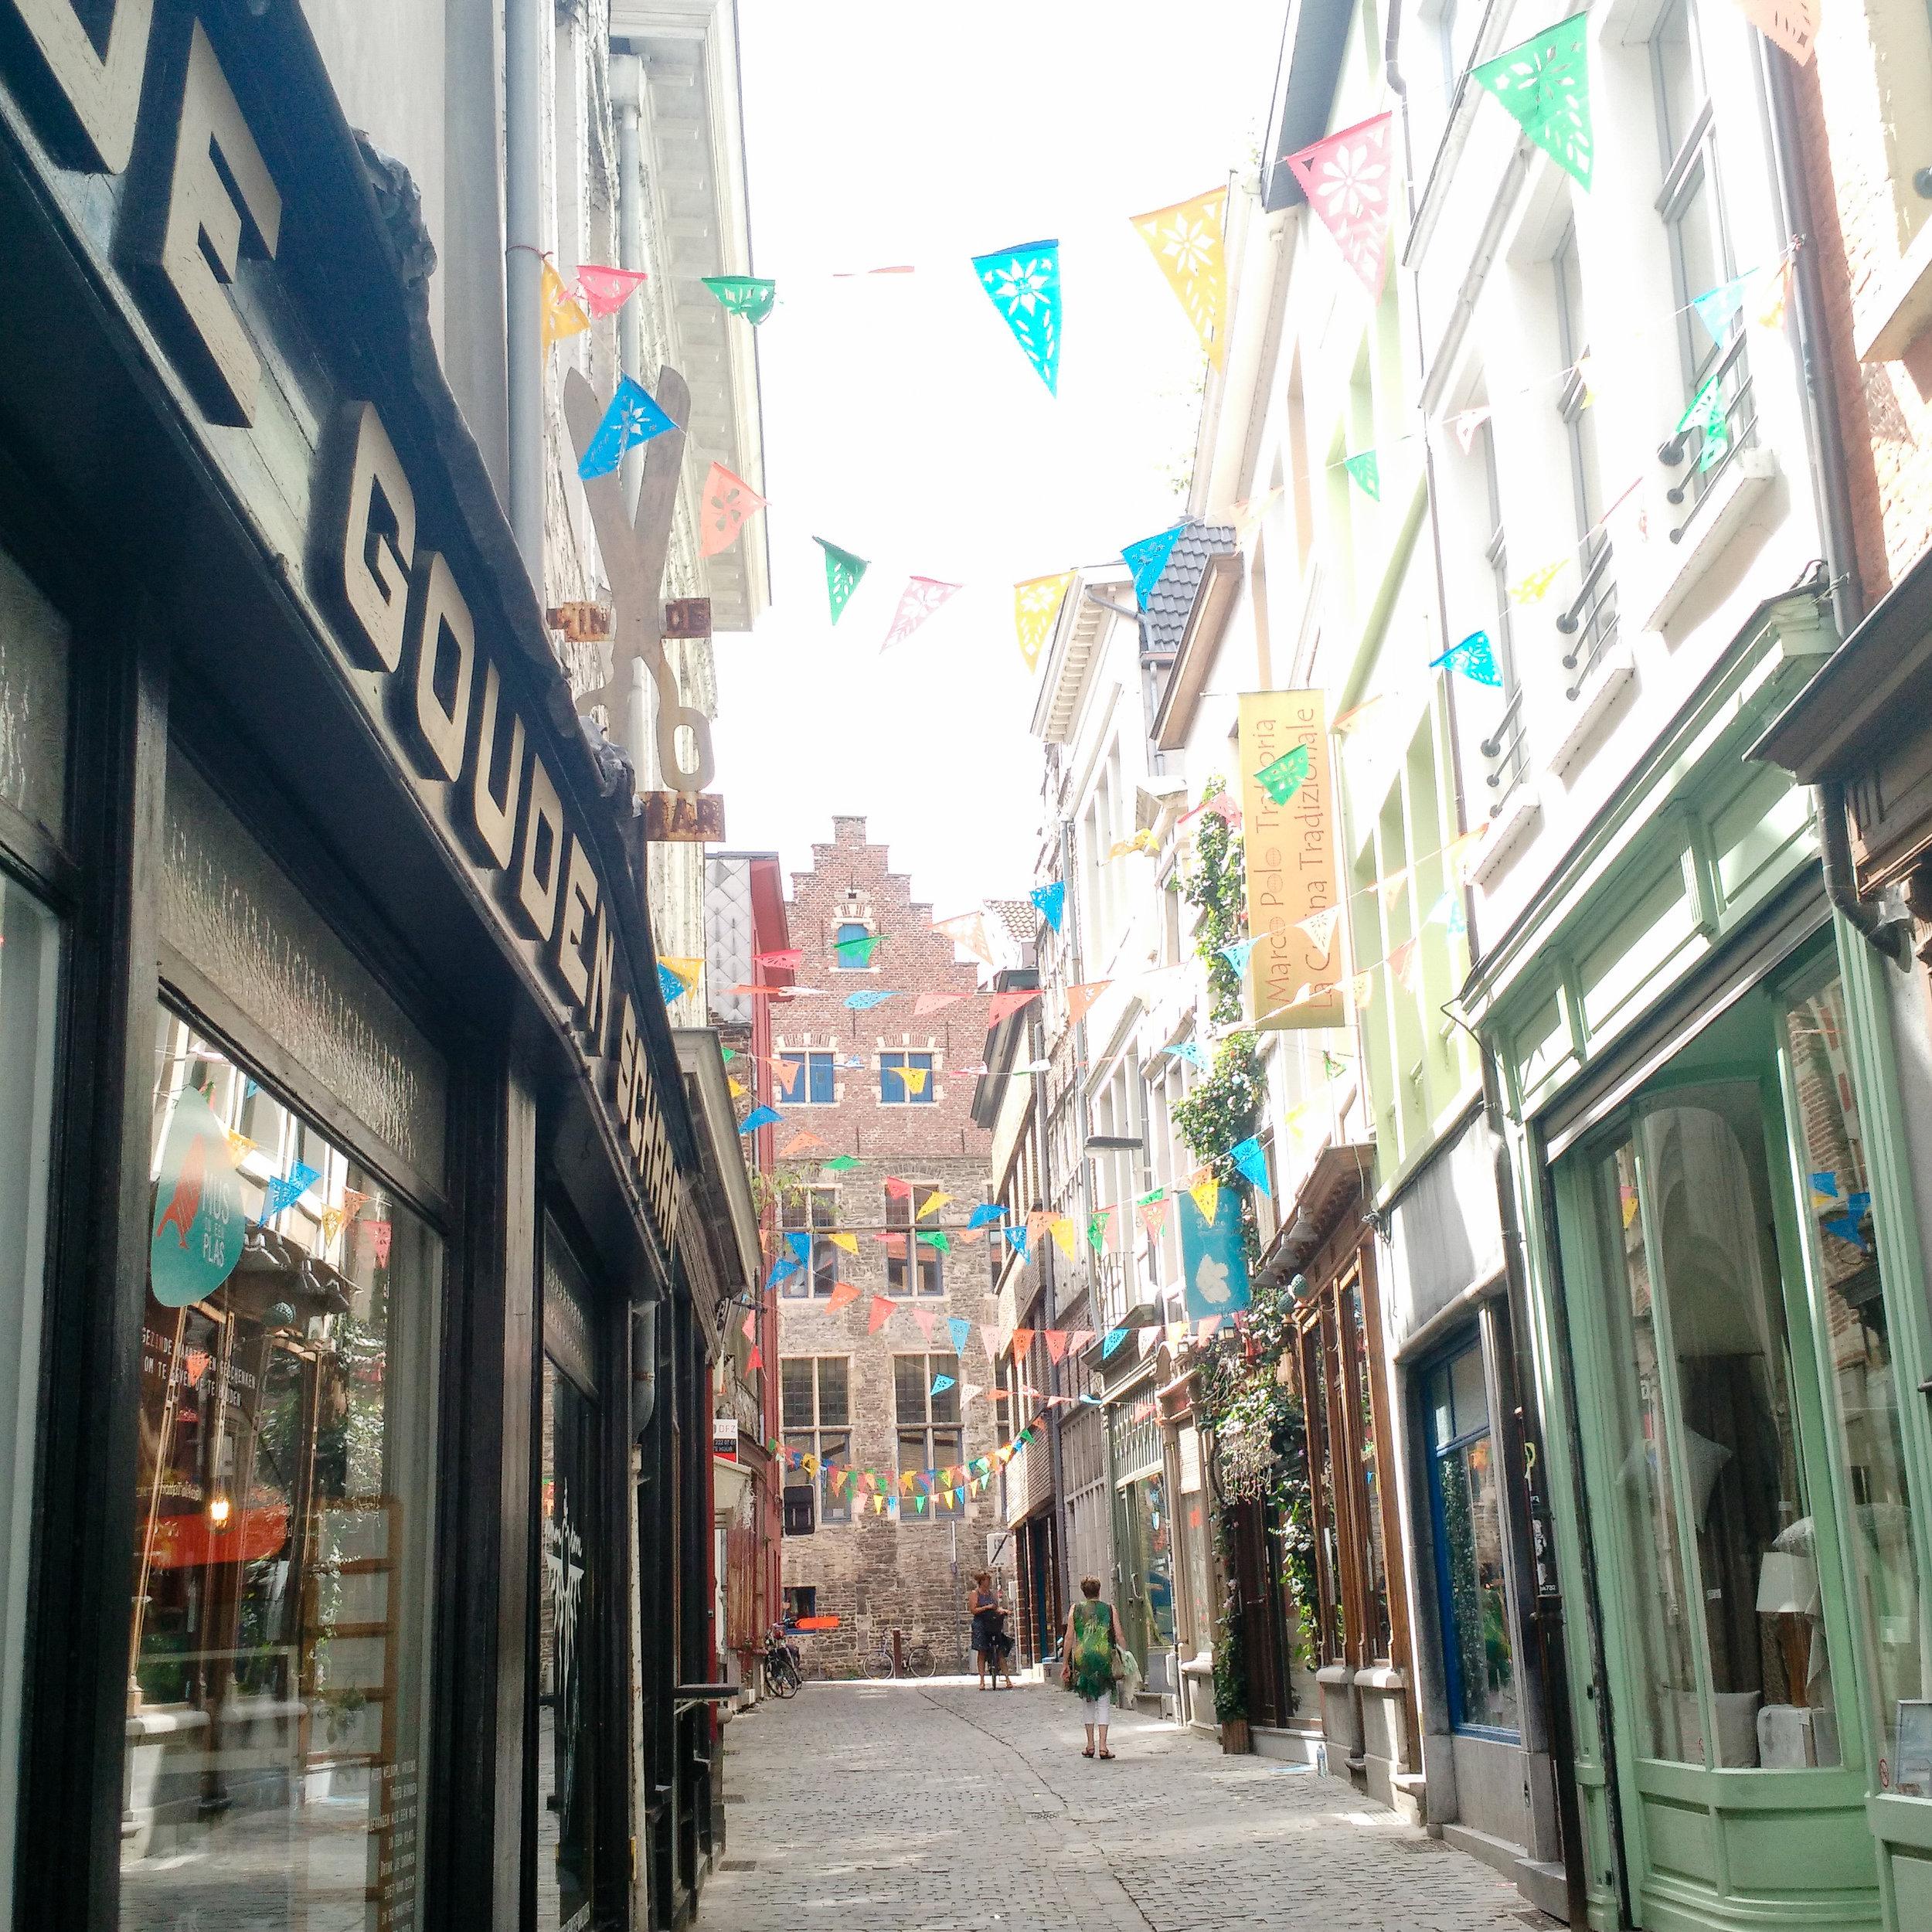 expat, belgium, expat life, Gent, historical, side streets